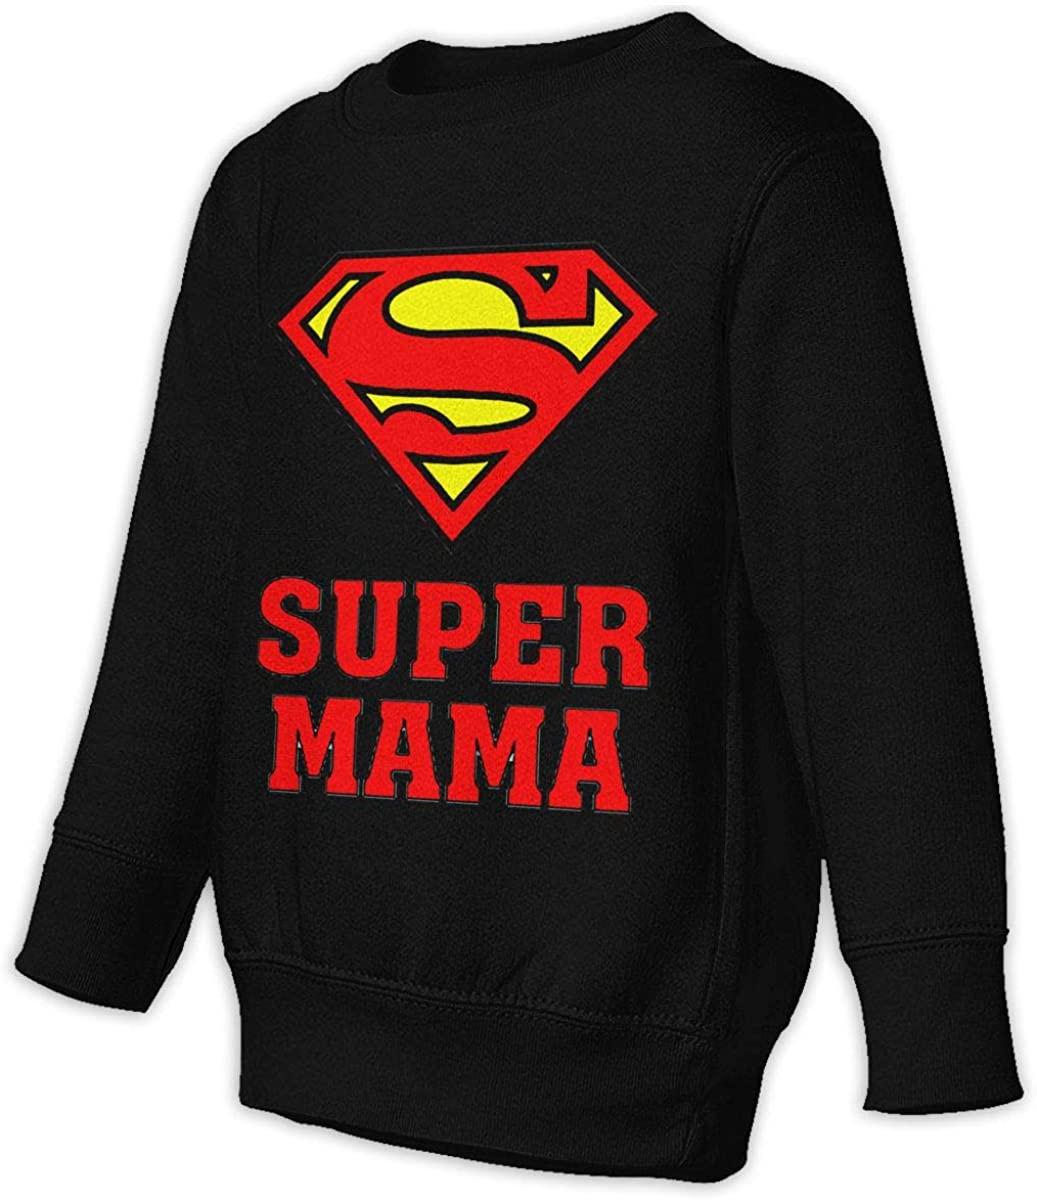 1836 Super Mama Unisex Sweatshirt Youth Boy and Girls Pullover Sweatshirt